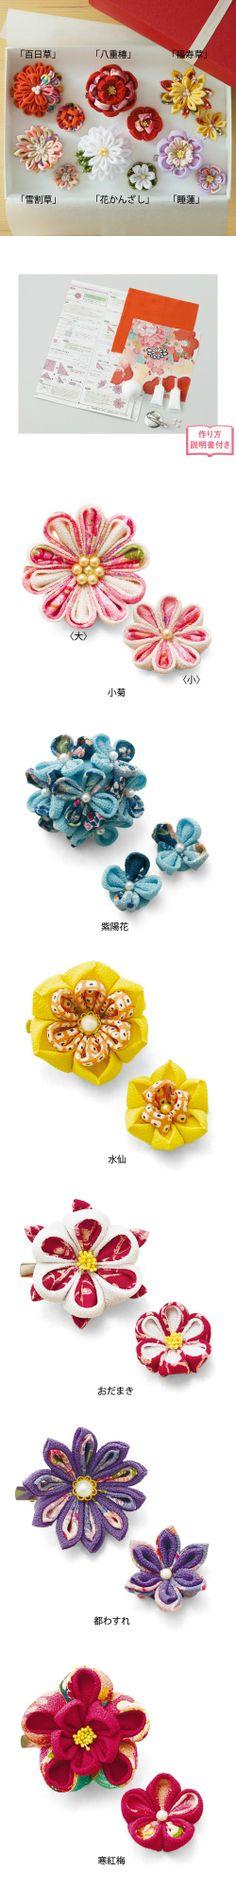 DIY Kanzashi Fabric Flower (Part 1)   ちりめんで形にする和の趣 四季折々つまみ細工のお花の会(12回限定コレクション)zakka collection (JP)